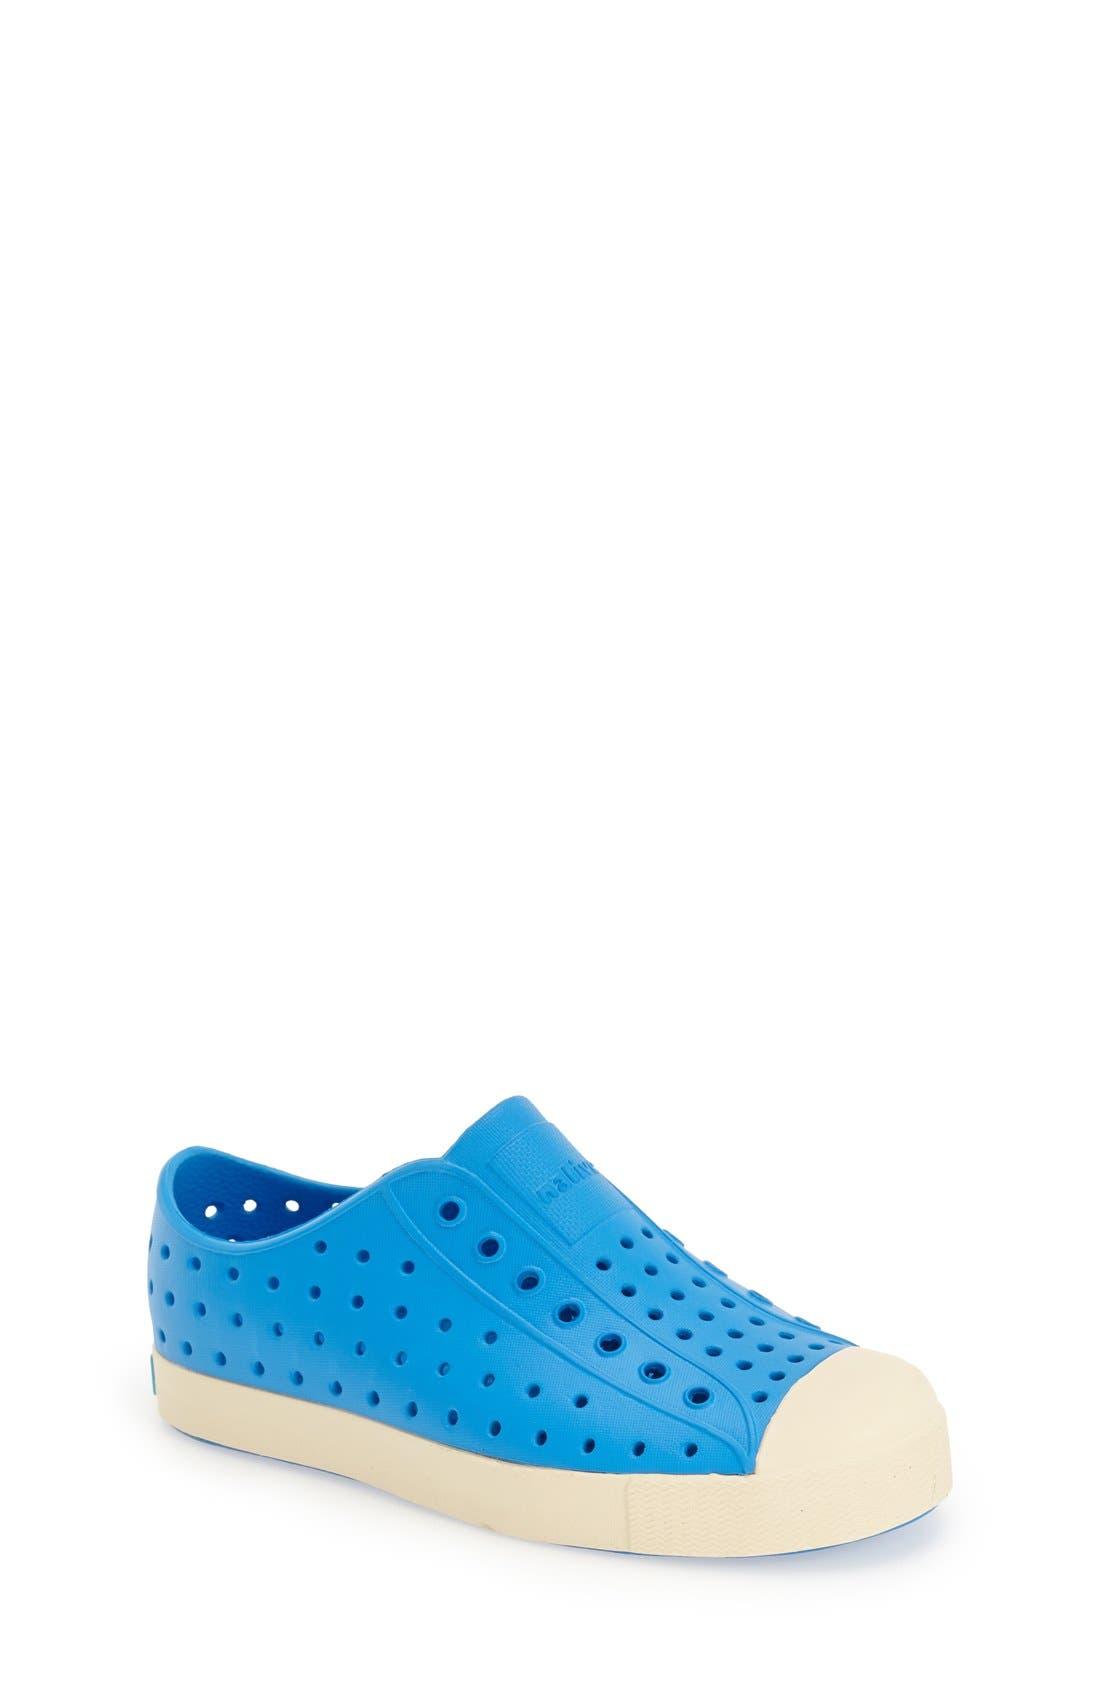 'Jefferson' Water Friendly Slip-On Sneaker,                             Main thumbnail 47, color,